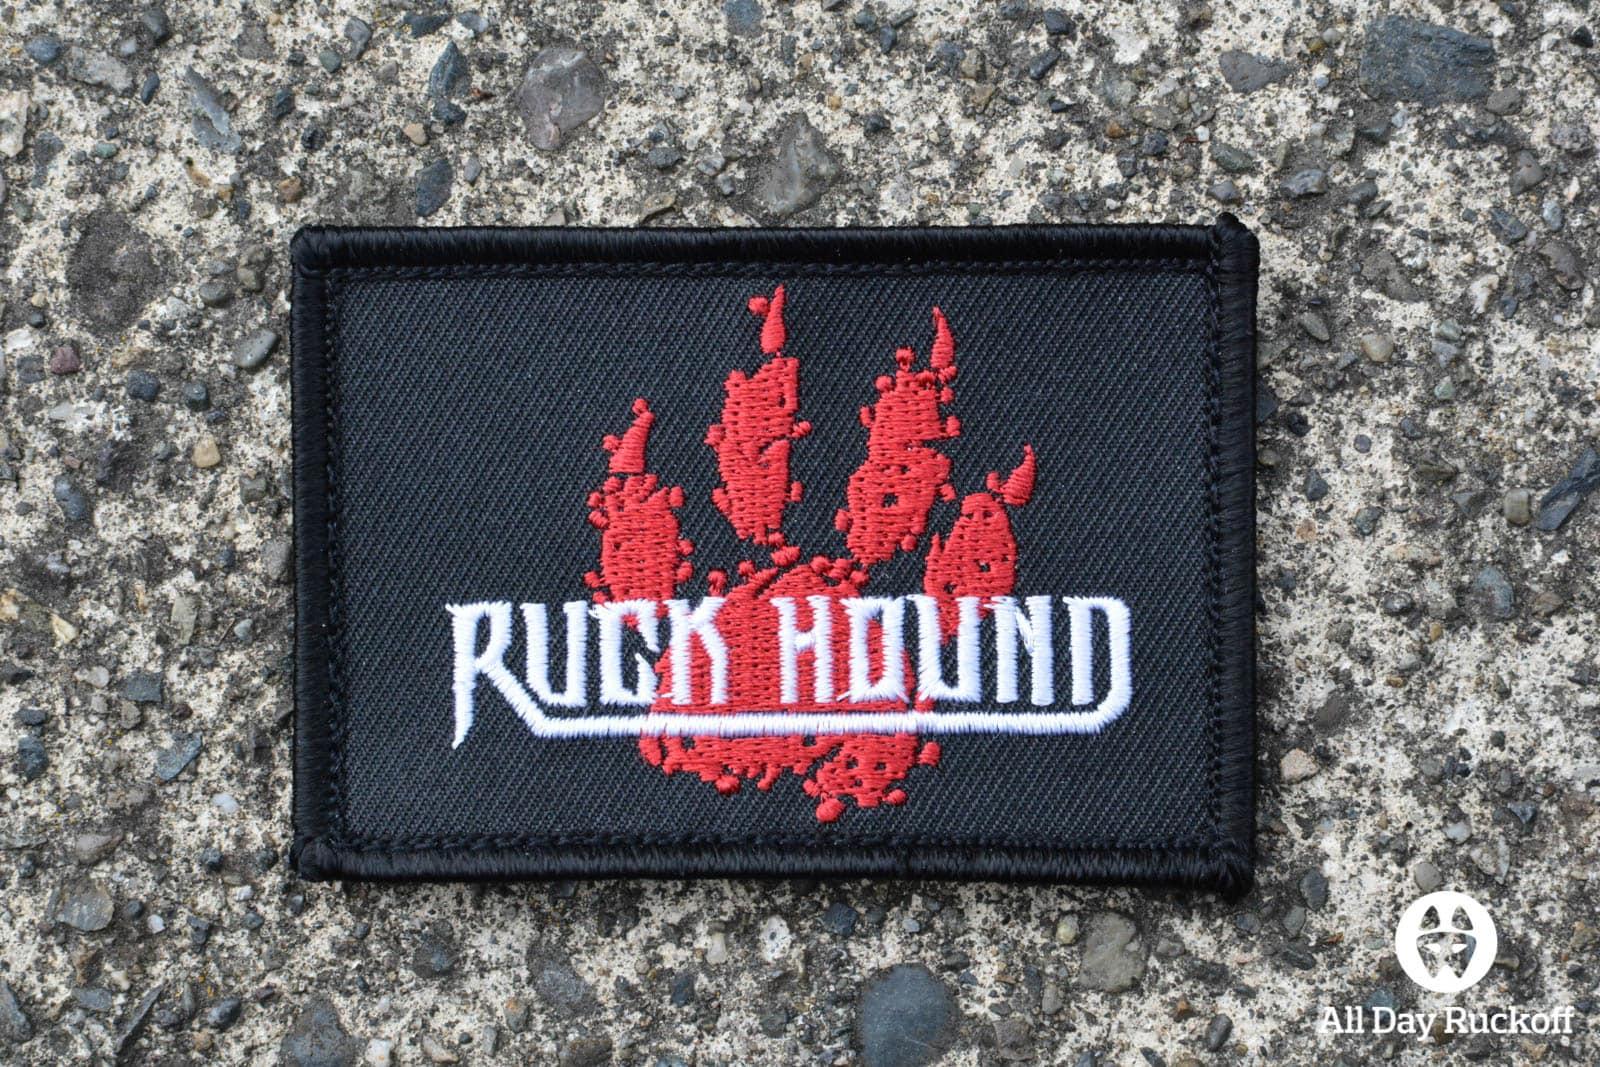 Ruck Hound Paw Print Patch